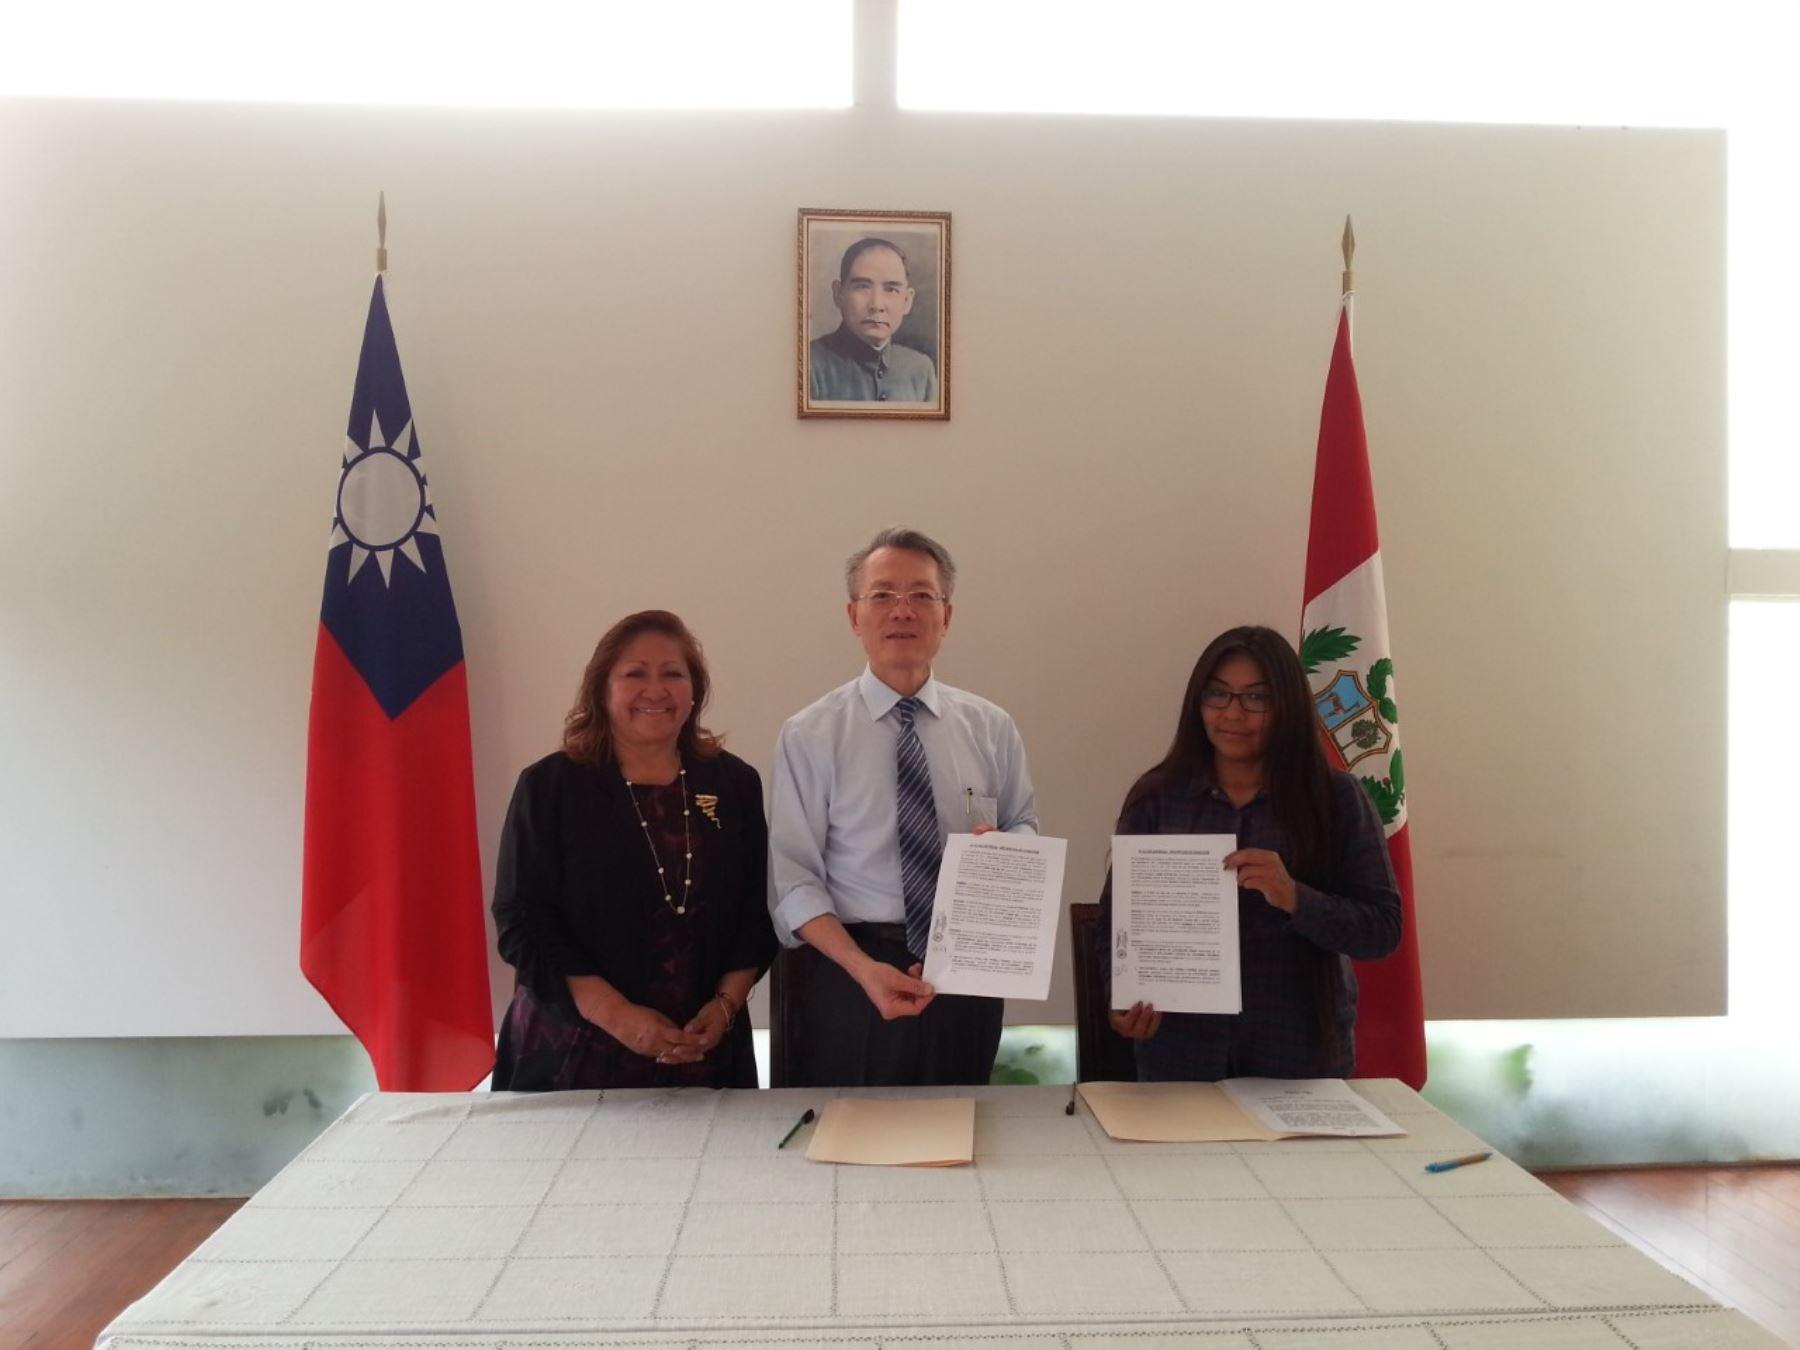 Taipei dona US$ 30,000 para rehabilitar infraestructrura pública tras sismo en Arequipa